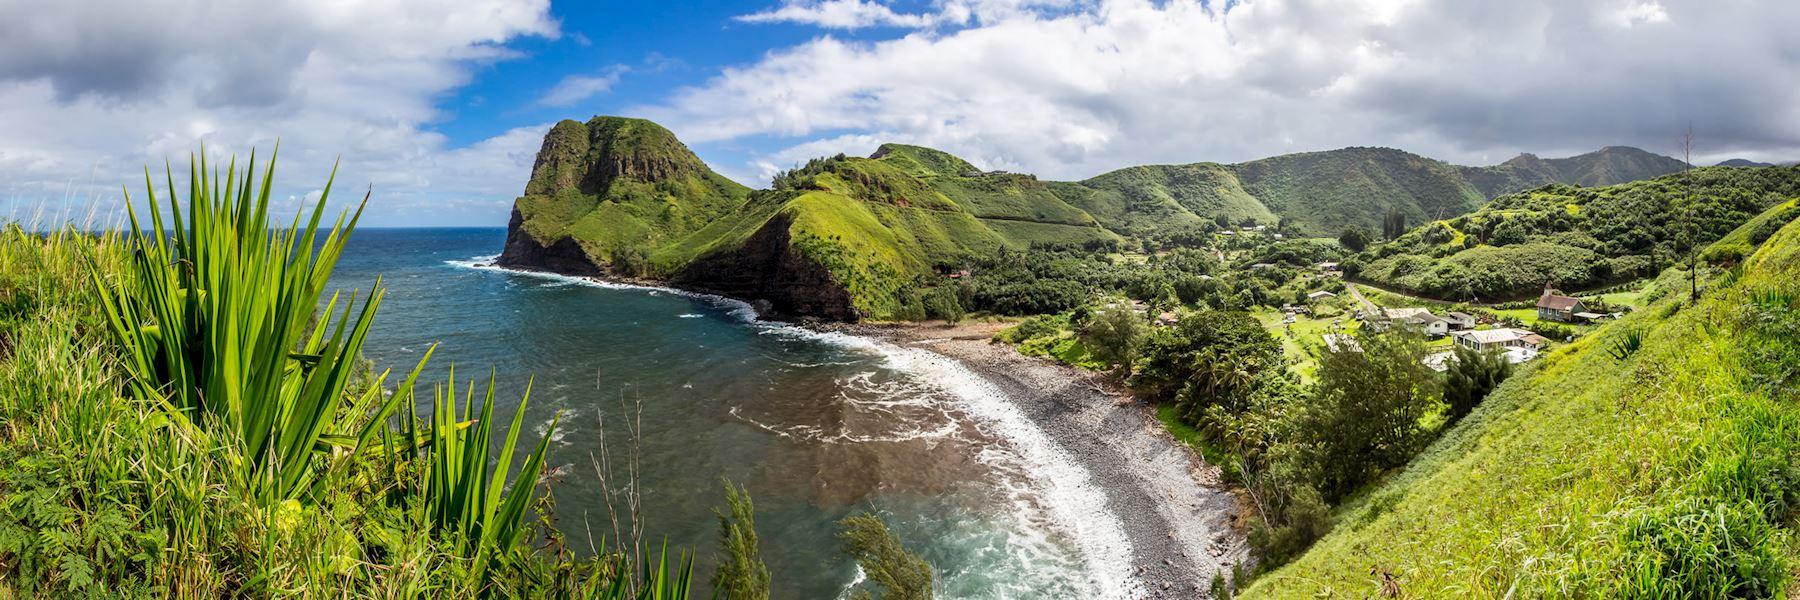 Visit Molokai, Hawaii